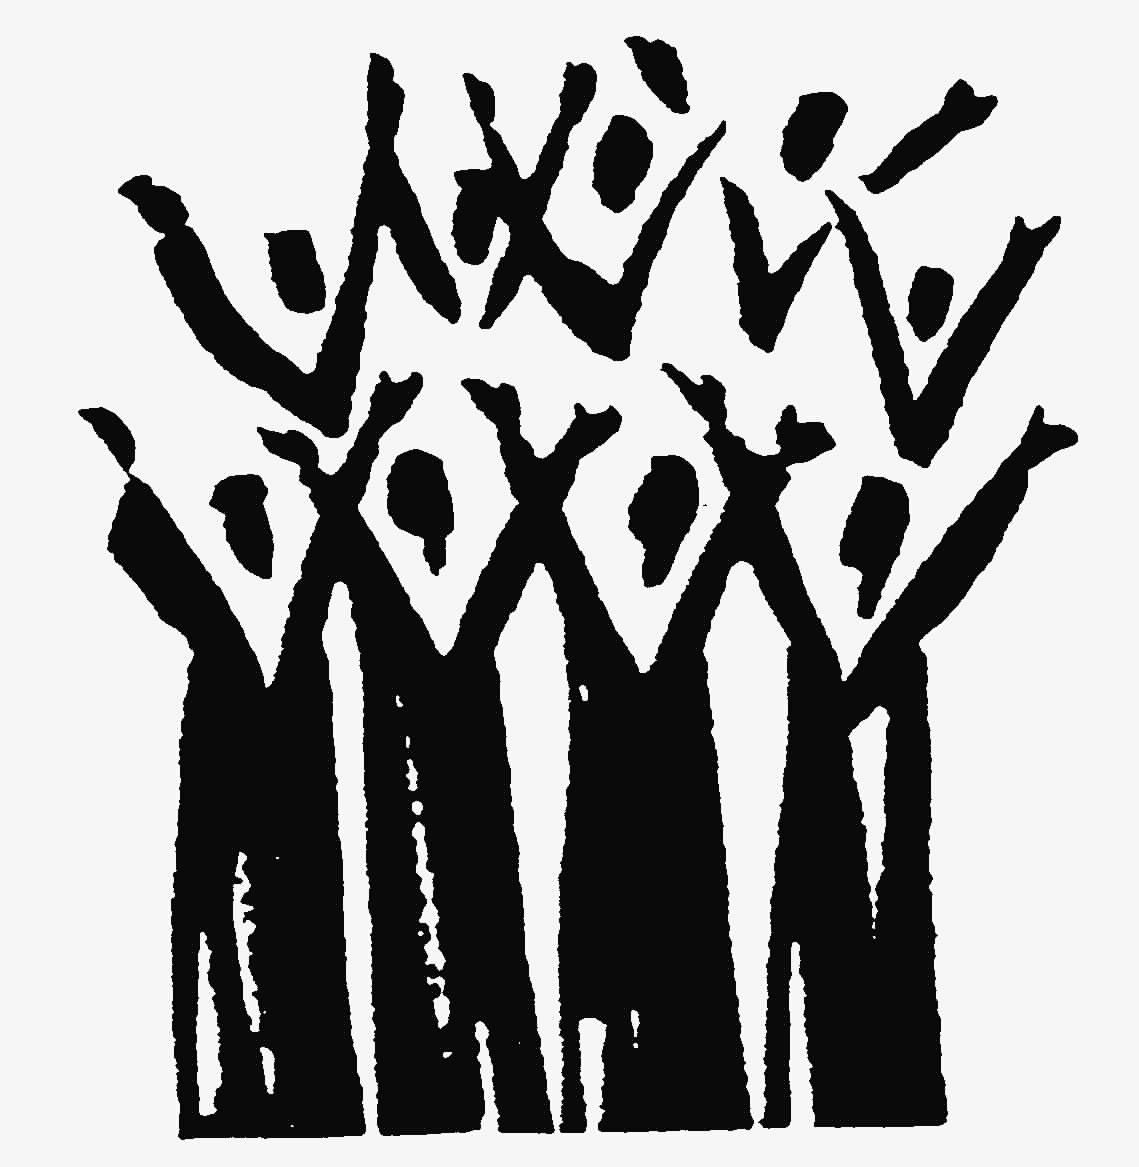 Choir Praise Free Images At Clker Com Vector Clip Art Online.